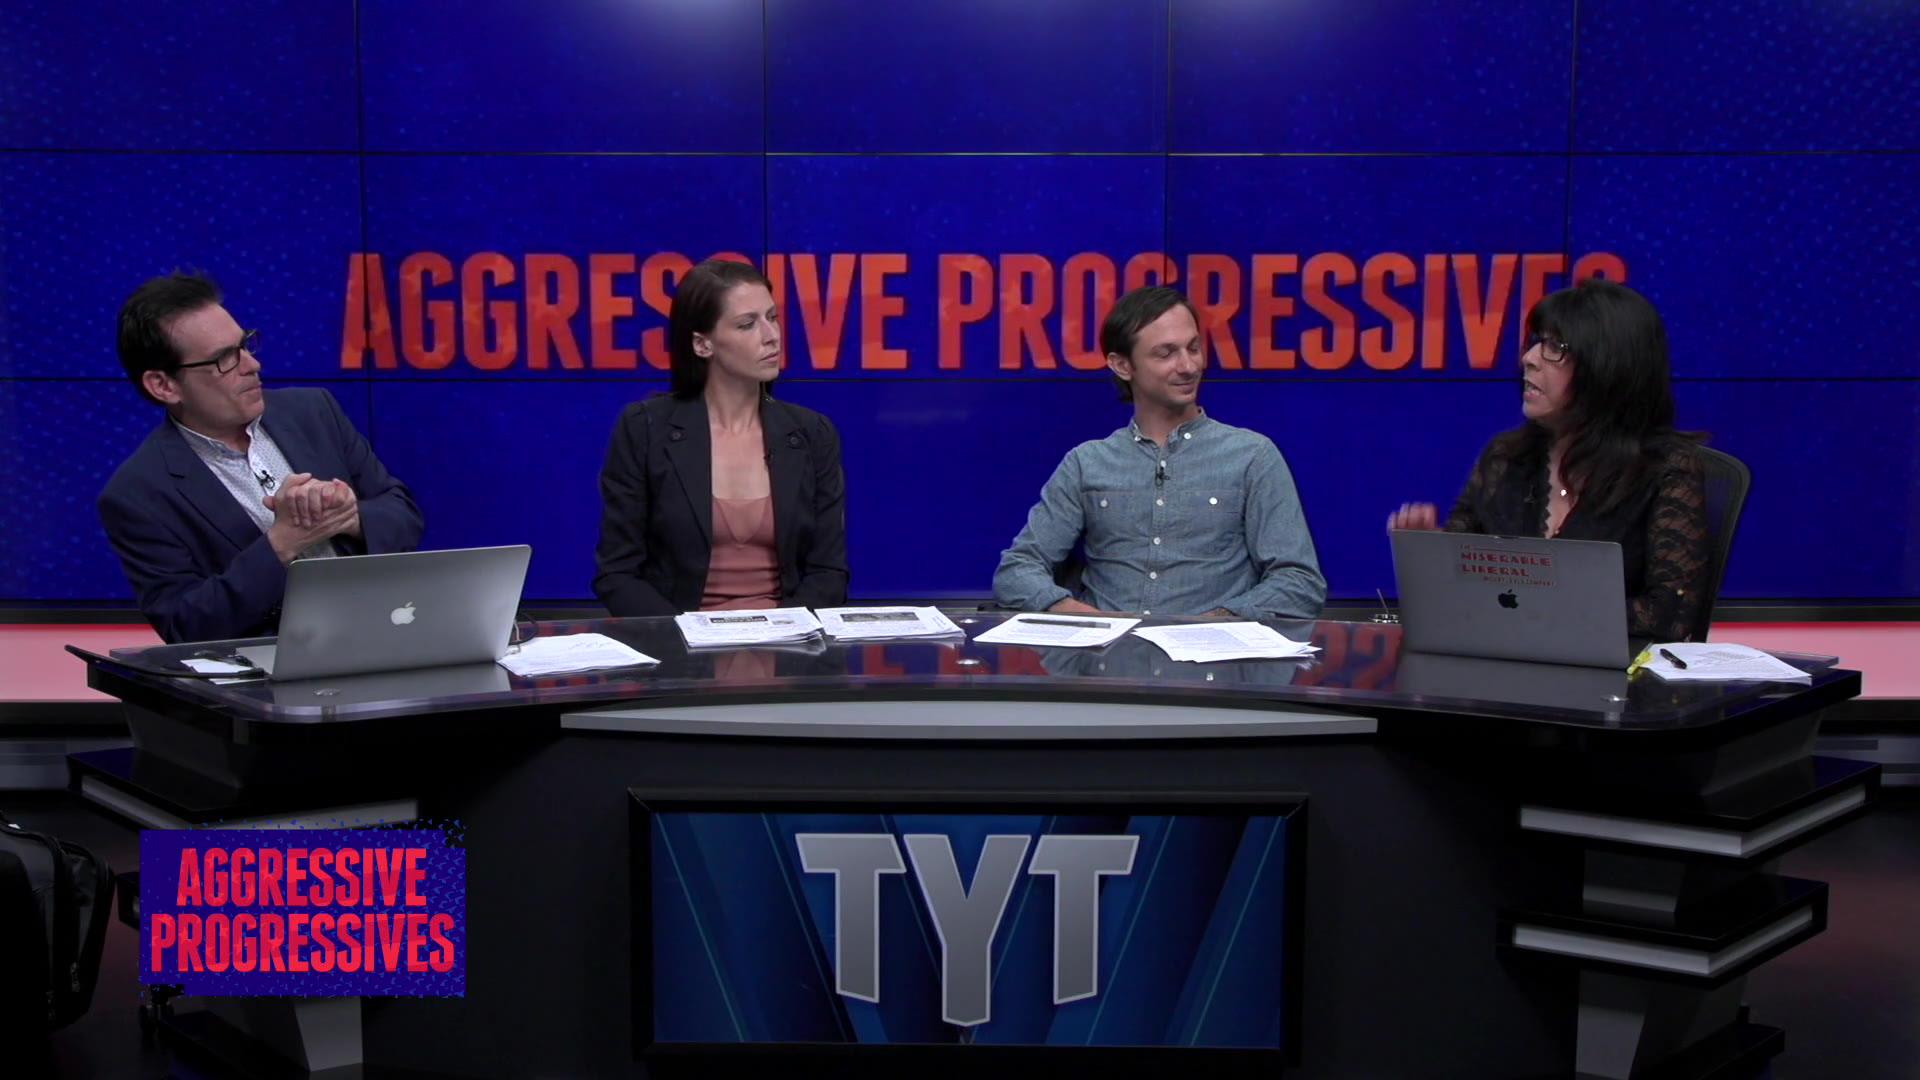 Aggressive Progressives August 22, 2018